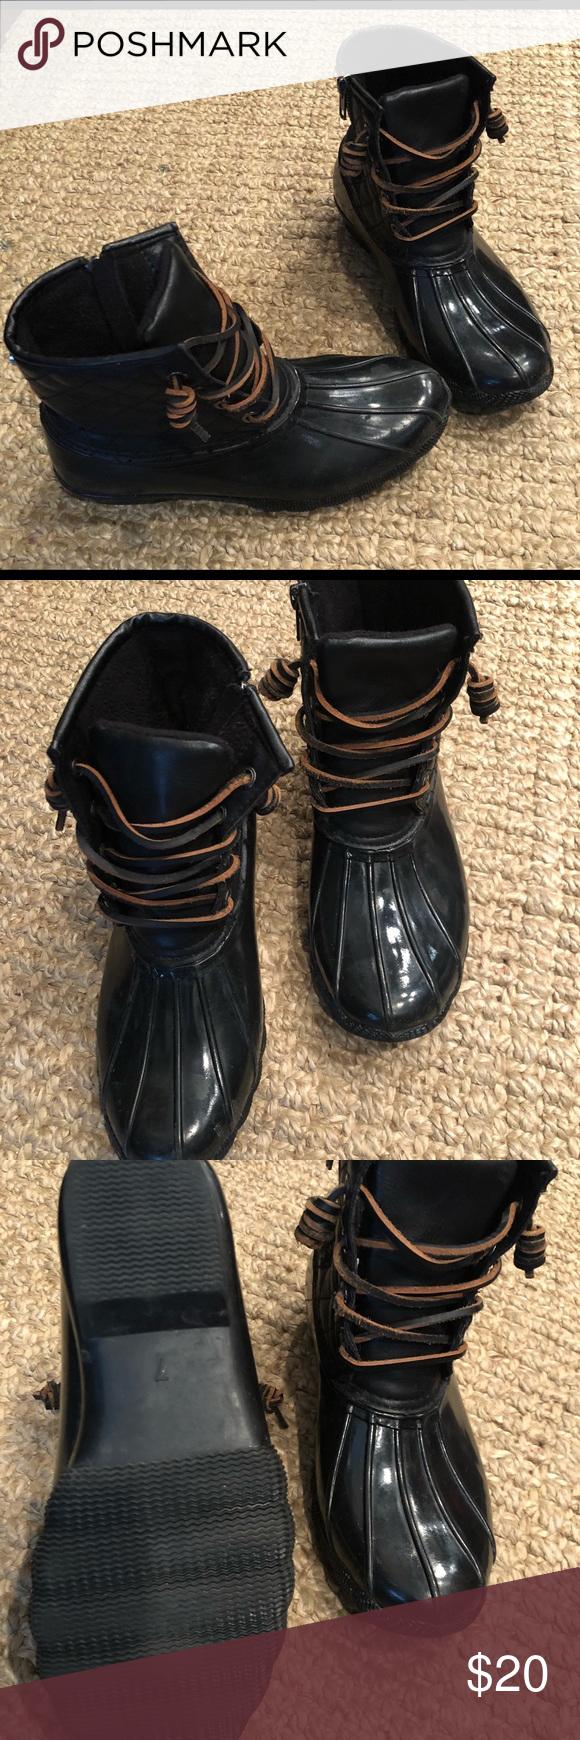 e2c70c3fdad Steve Madden Duck Boots Size 7 Lightly worn black Steve Madden duck ...